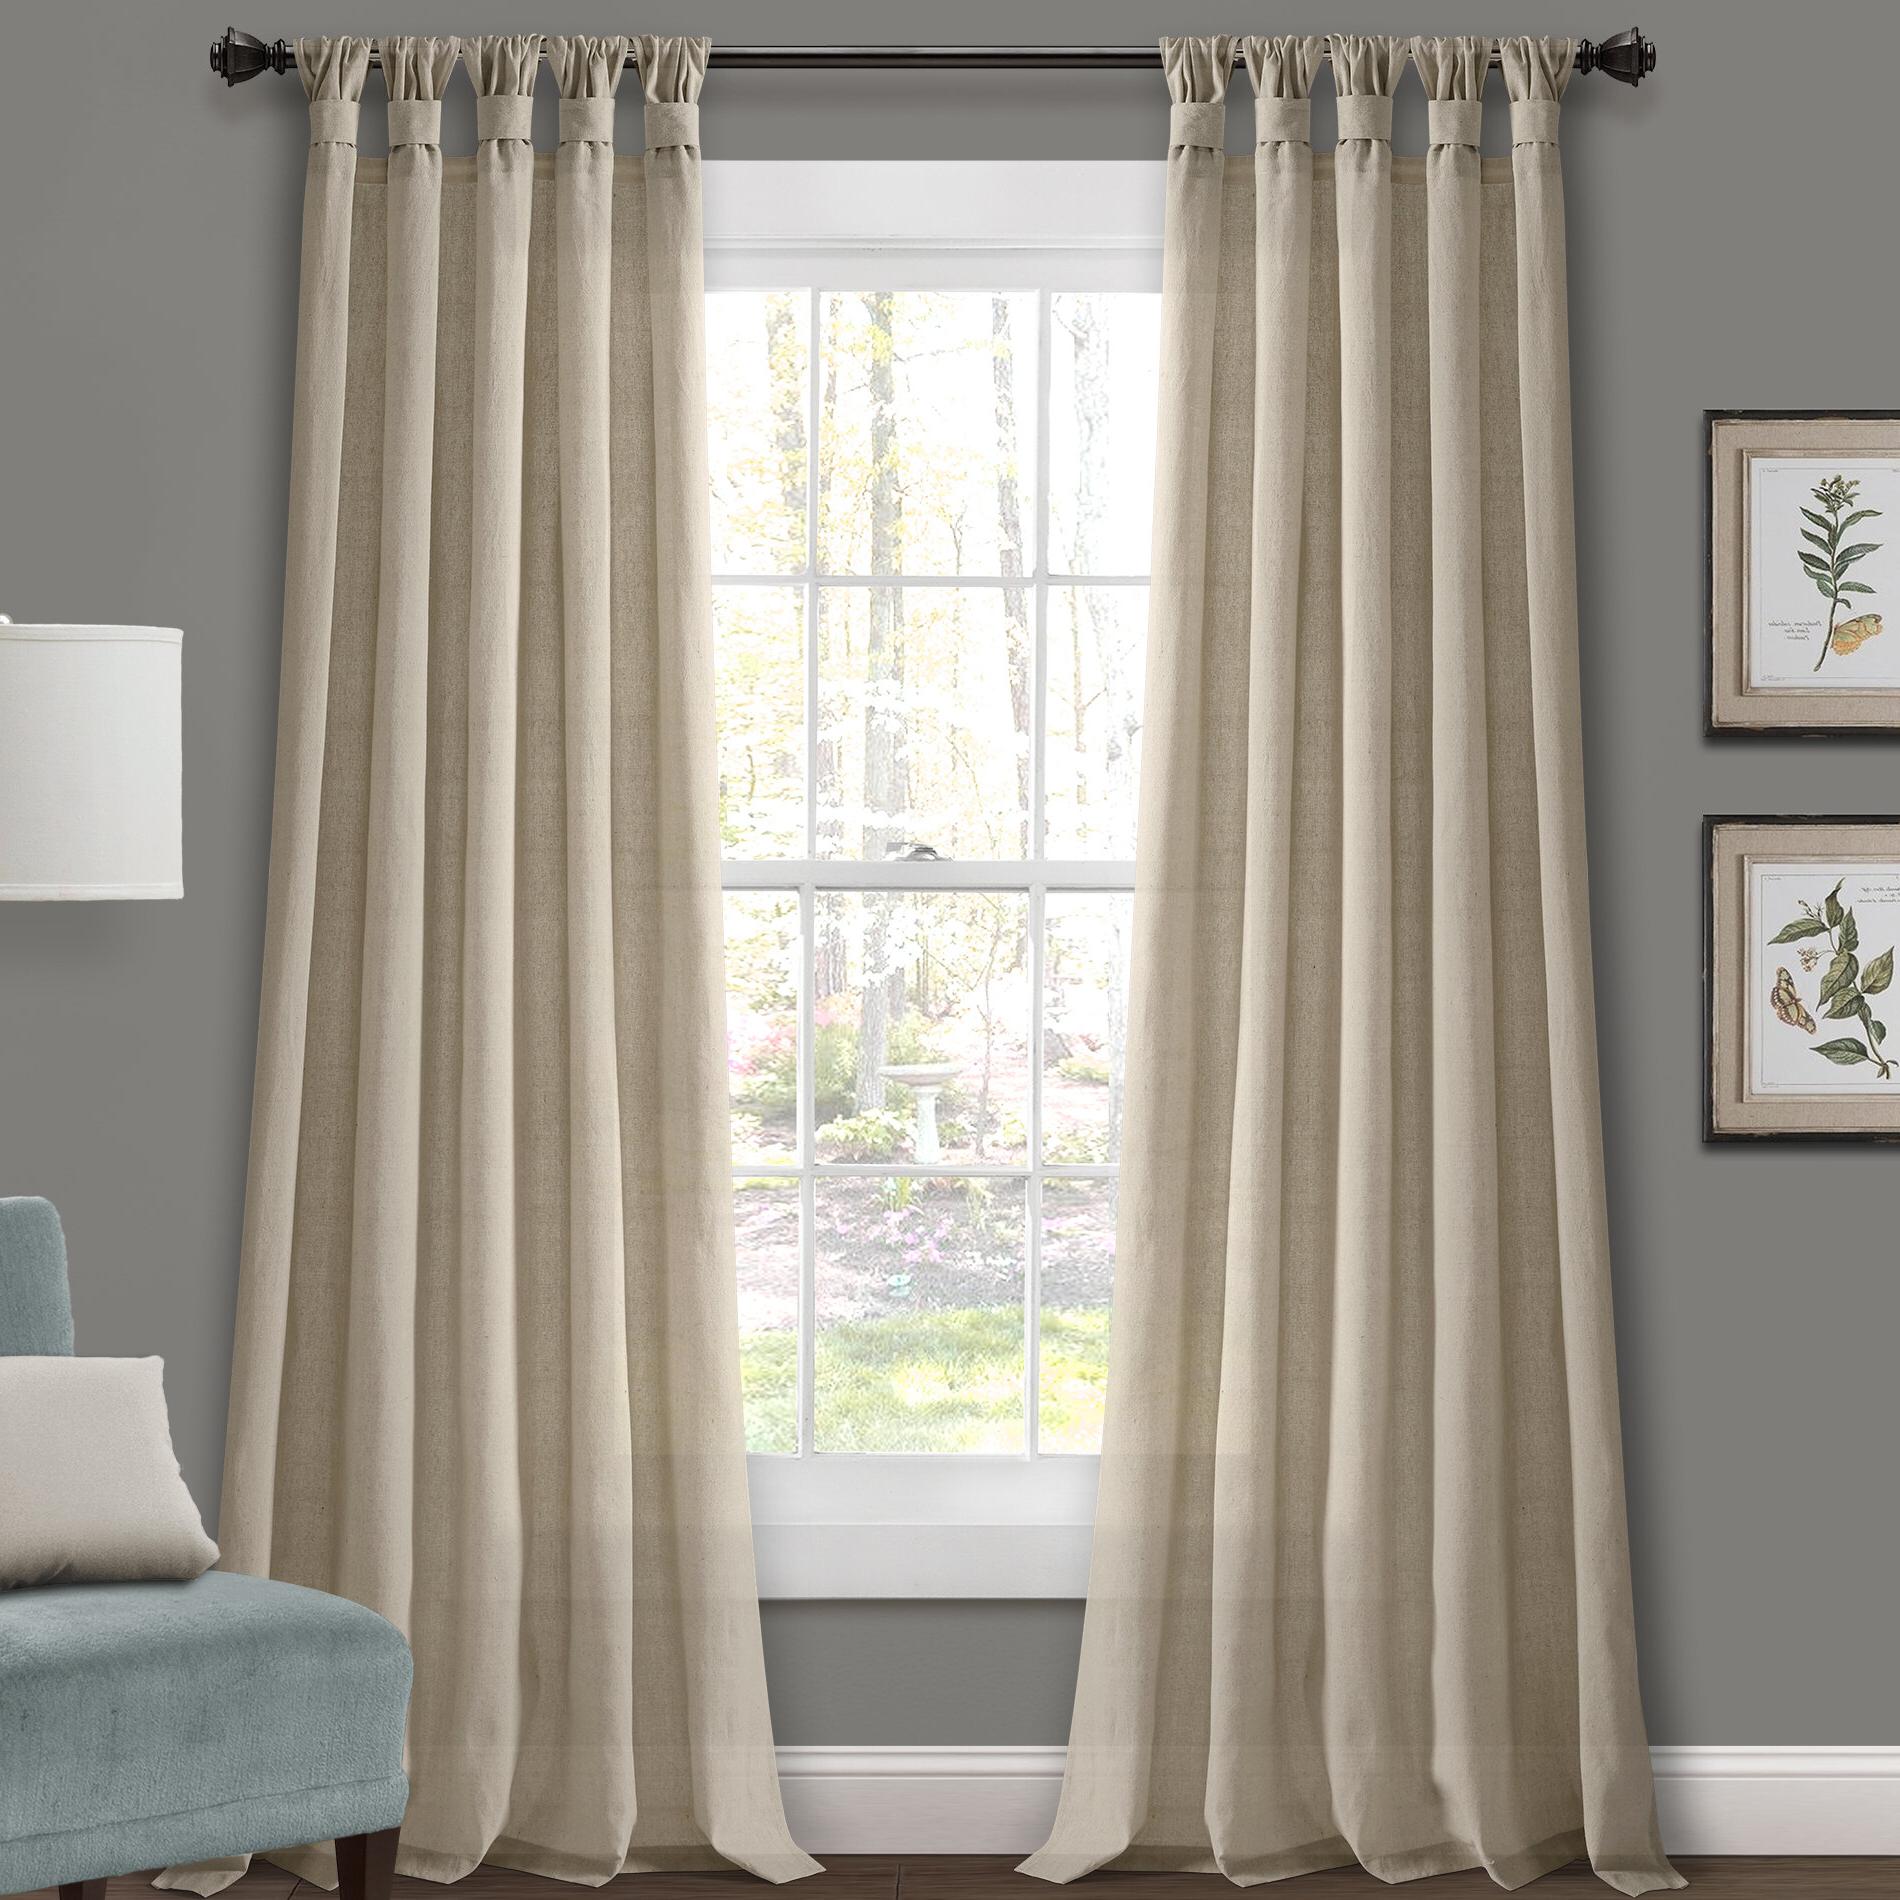 Most Popular Softline Trenton Grommet Top Curtain Panels In Canvas Linen Look 84 Drapes (View 20 of 20)